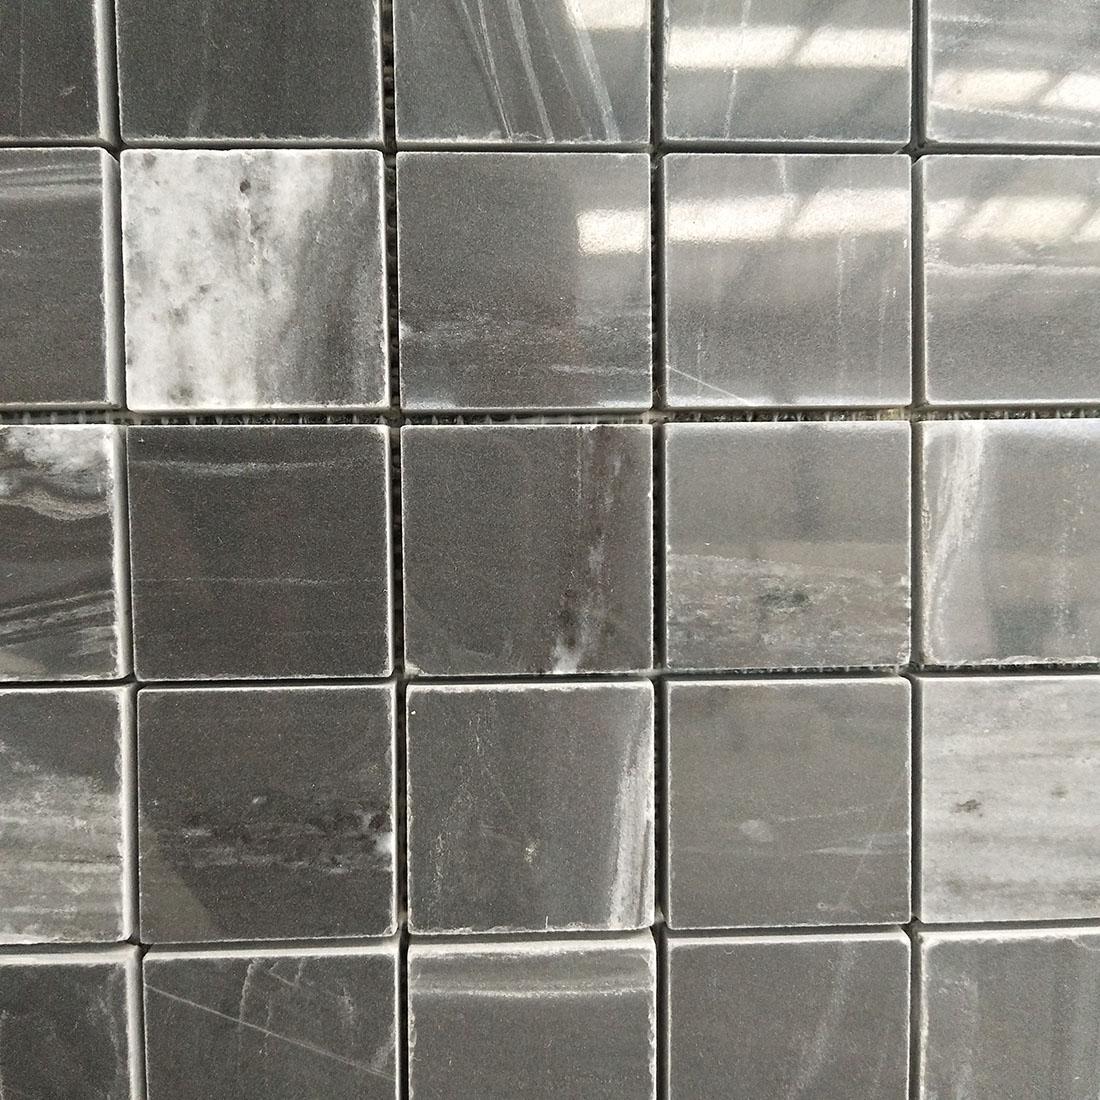 black marble mosaics tiles 12*12